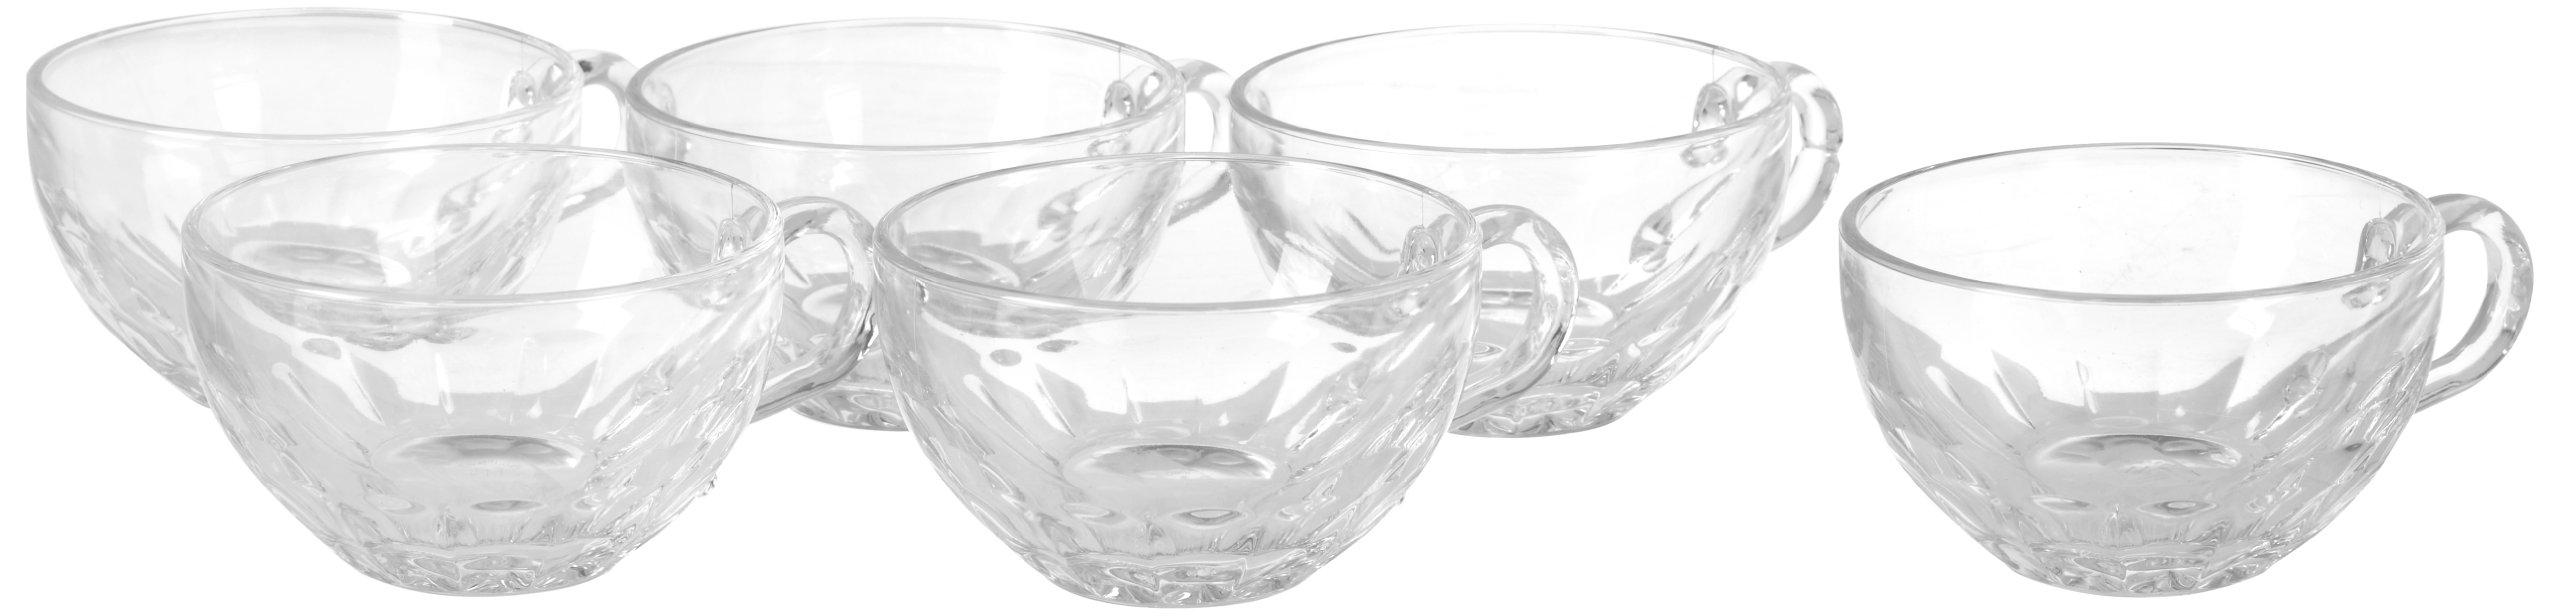 La Rochere Set Of 6, 11.5 oz. Coffee Cup, Louison